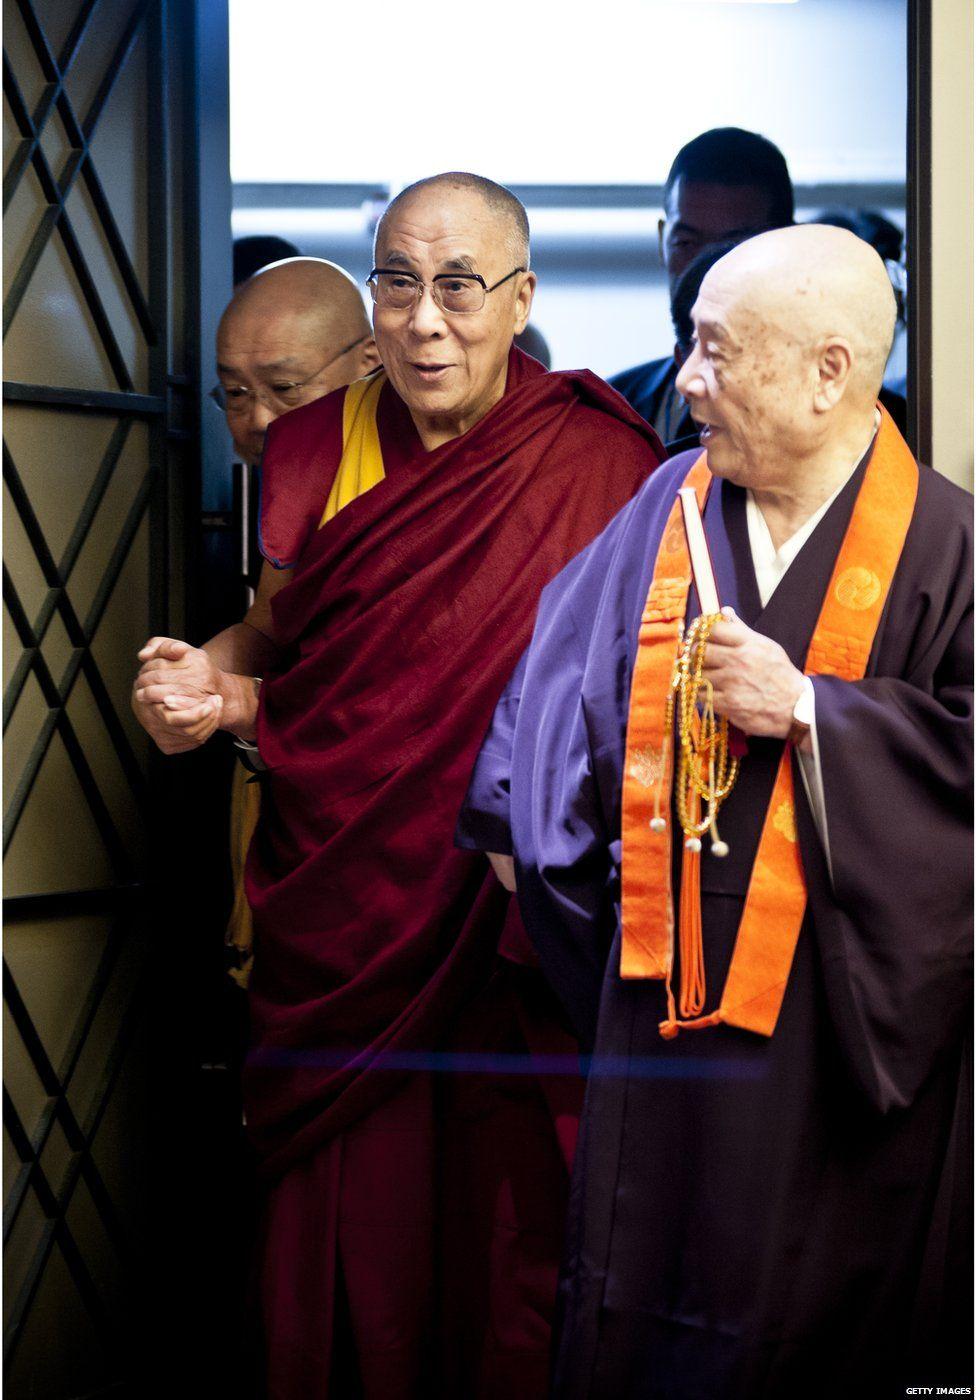 Tibetan spiritual leader the Dalai Lama (L) is introduced to guests during 'Dialogue in Tokyo' at Hotel Okura on 17 November 2013 in Tokyo, Japan